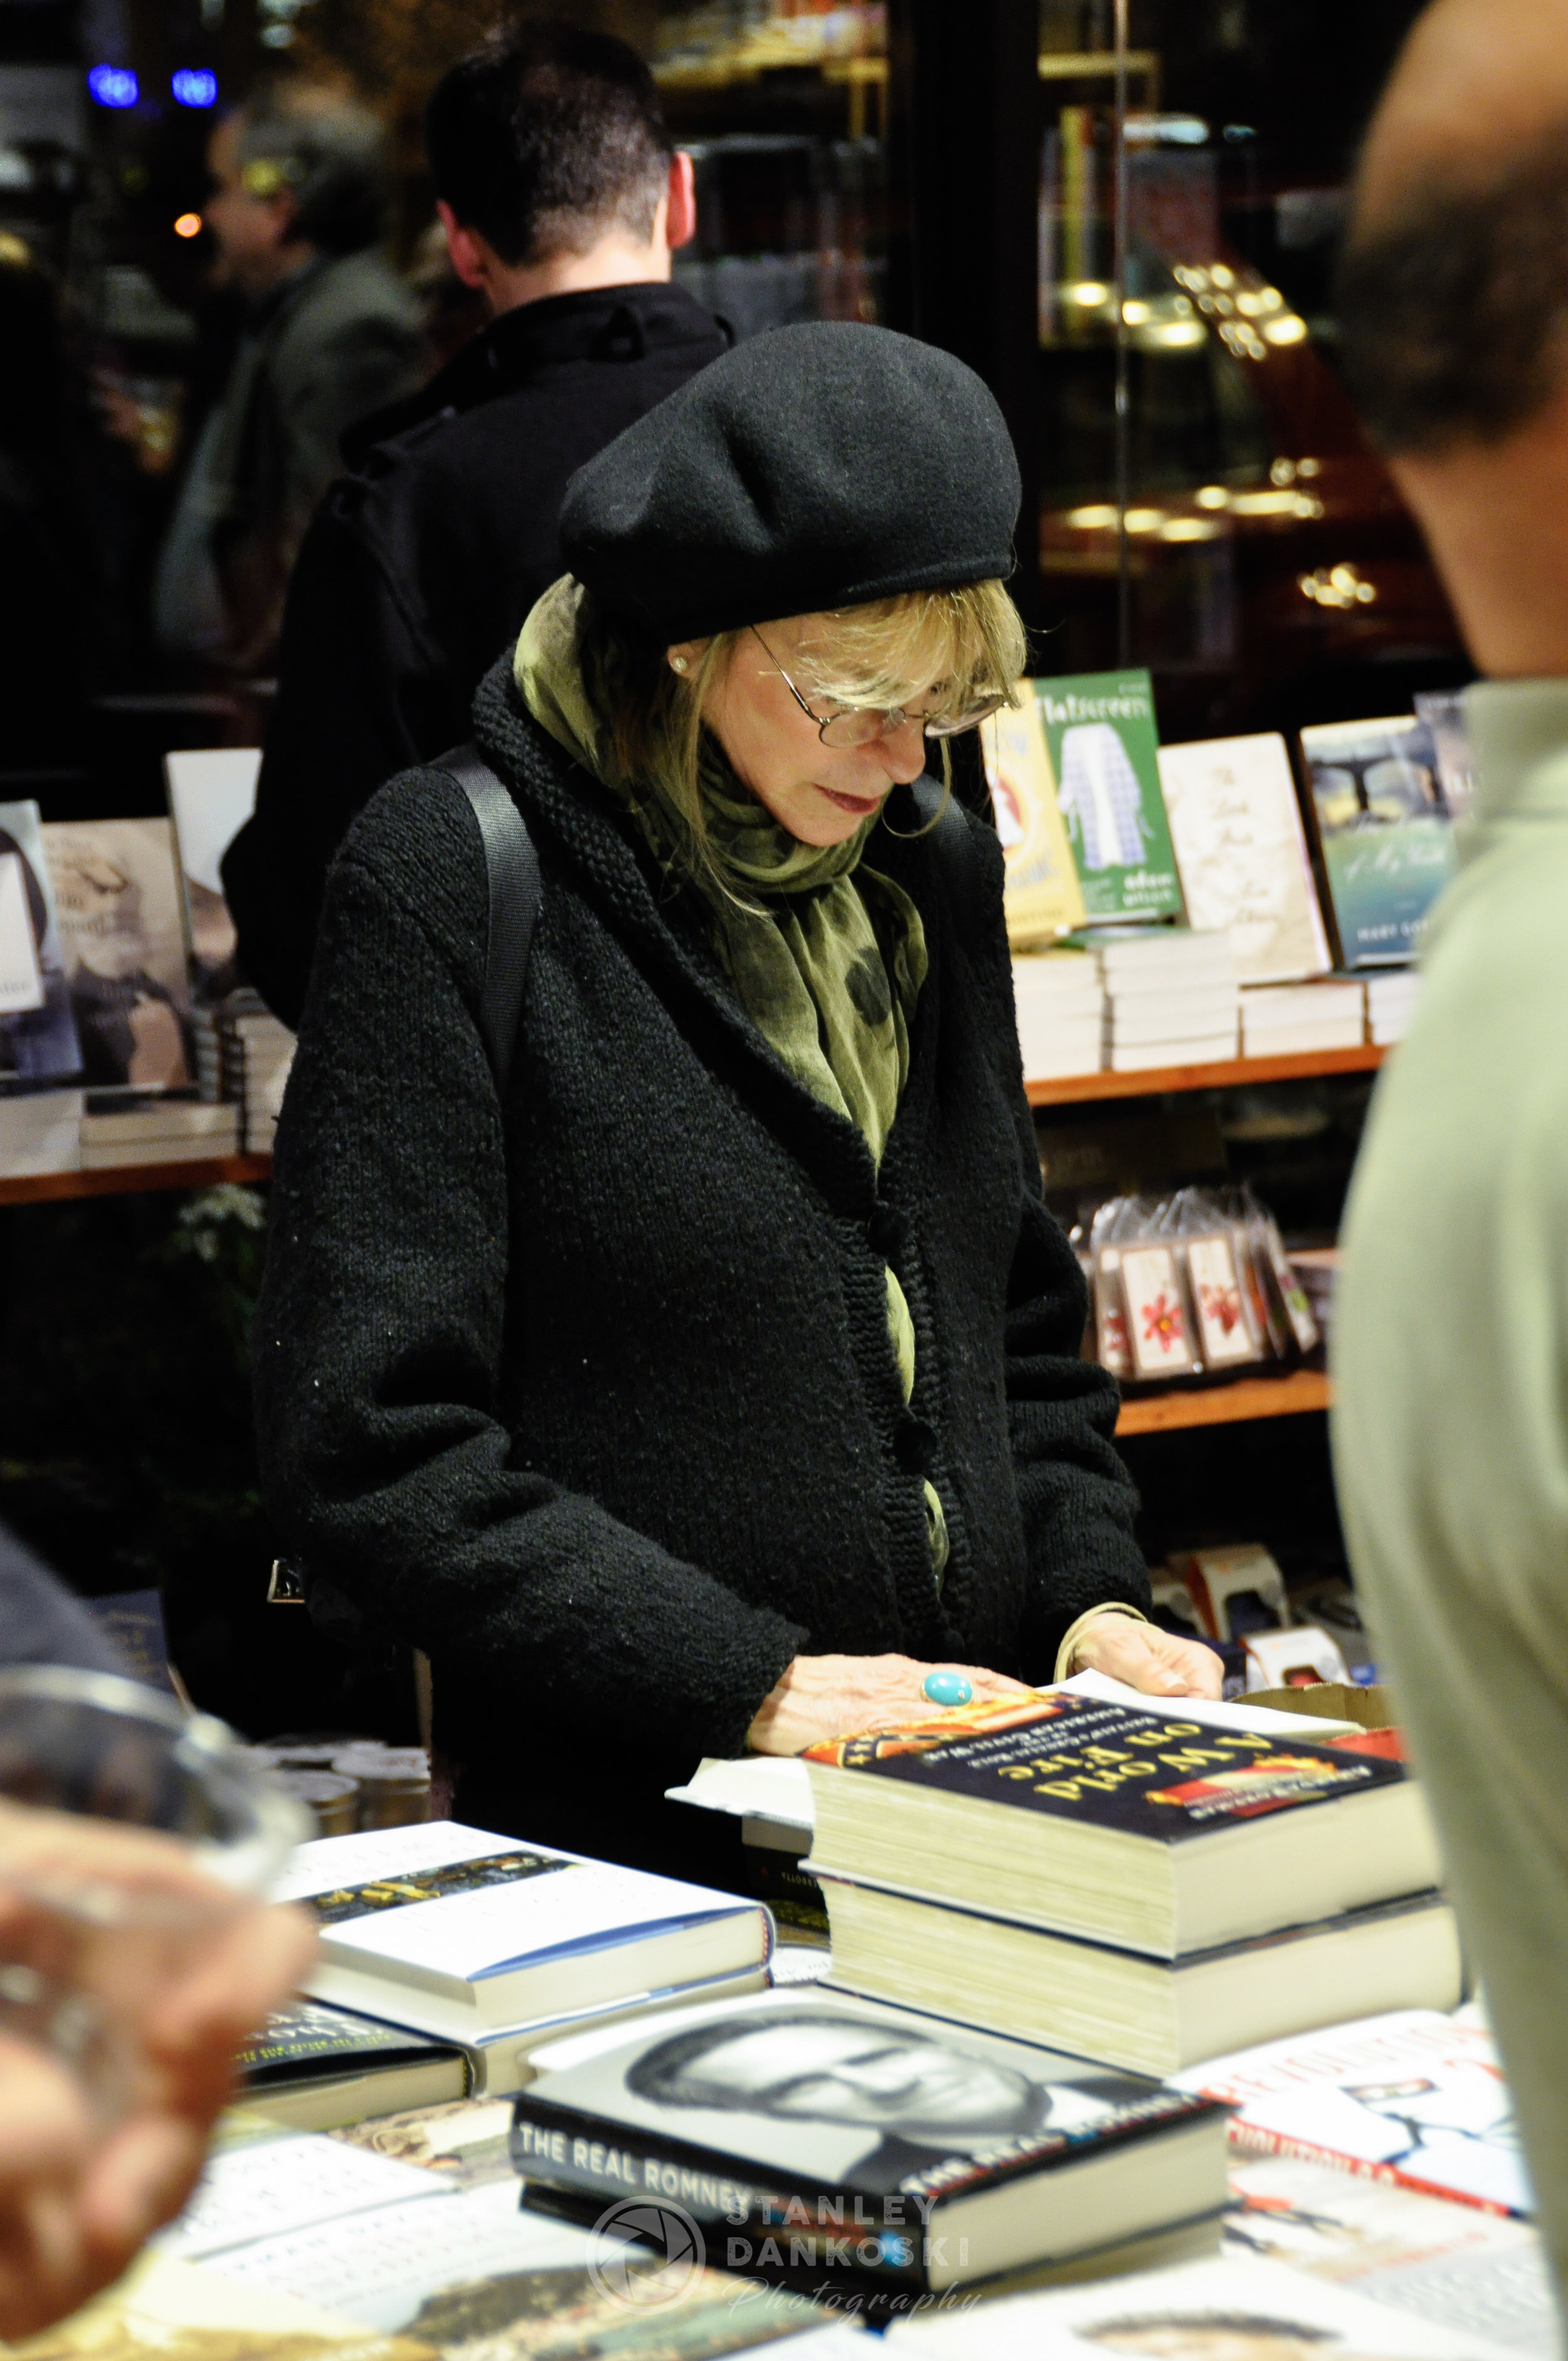 Newtonville Books grand opening, 2012